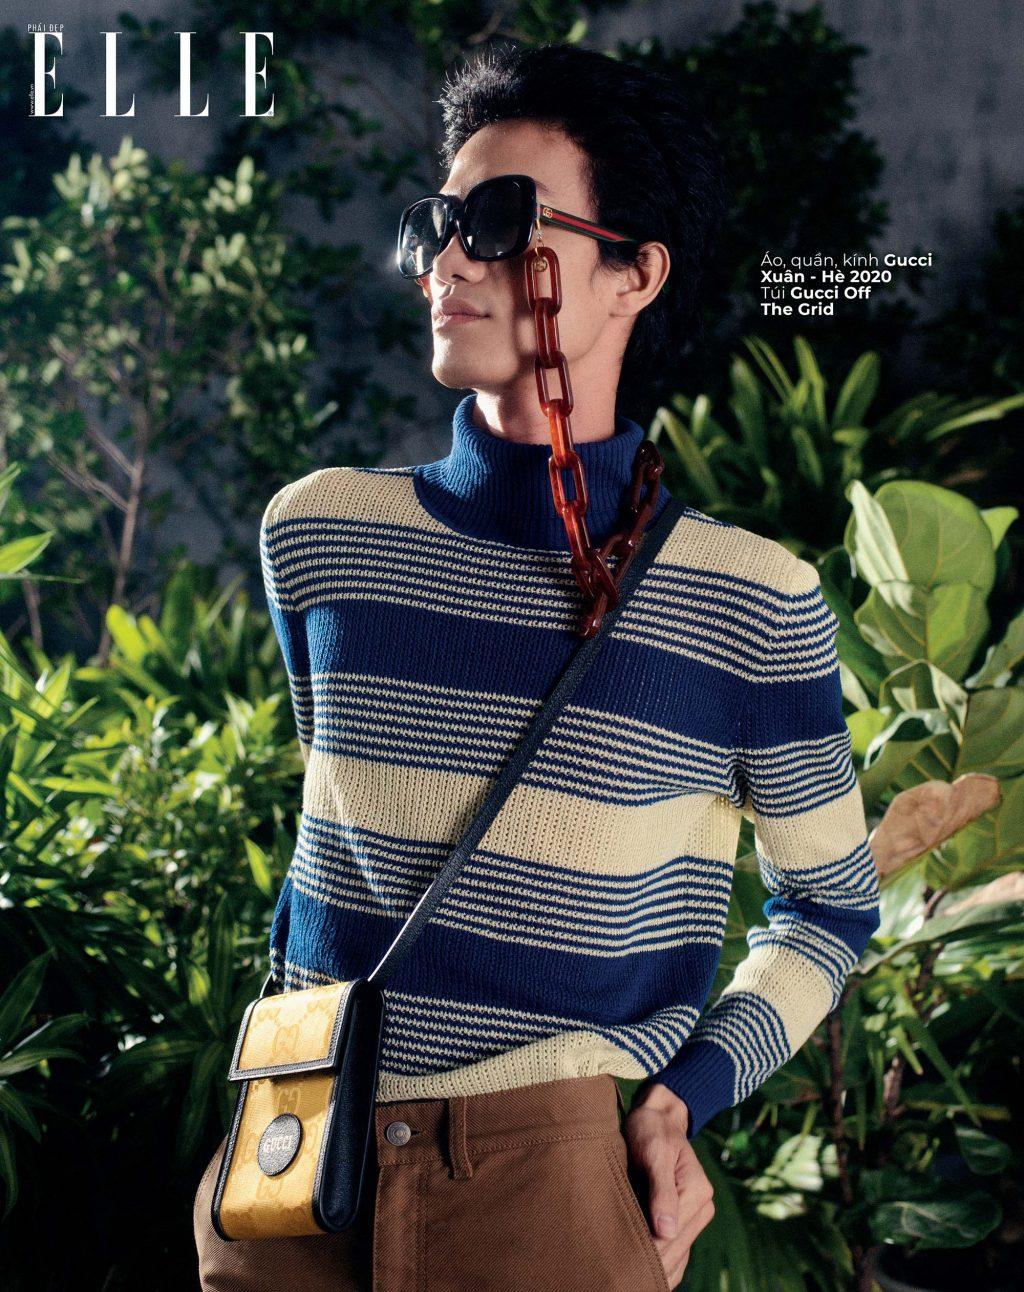 Gucci Off The Grid thời trang bền vững